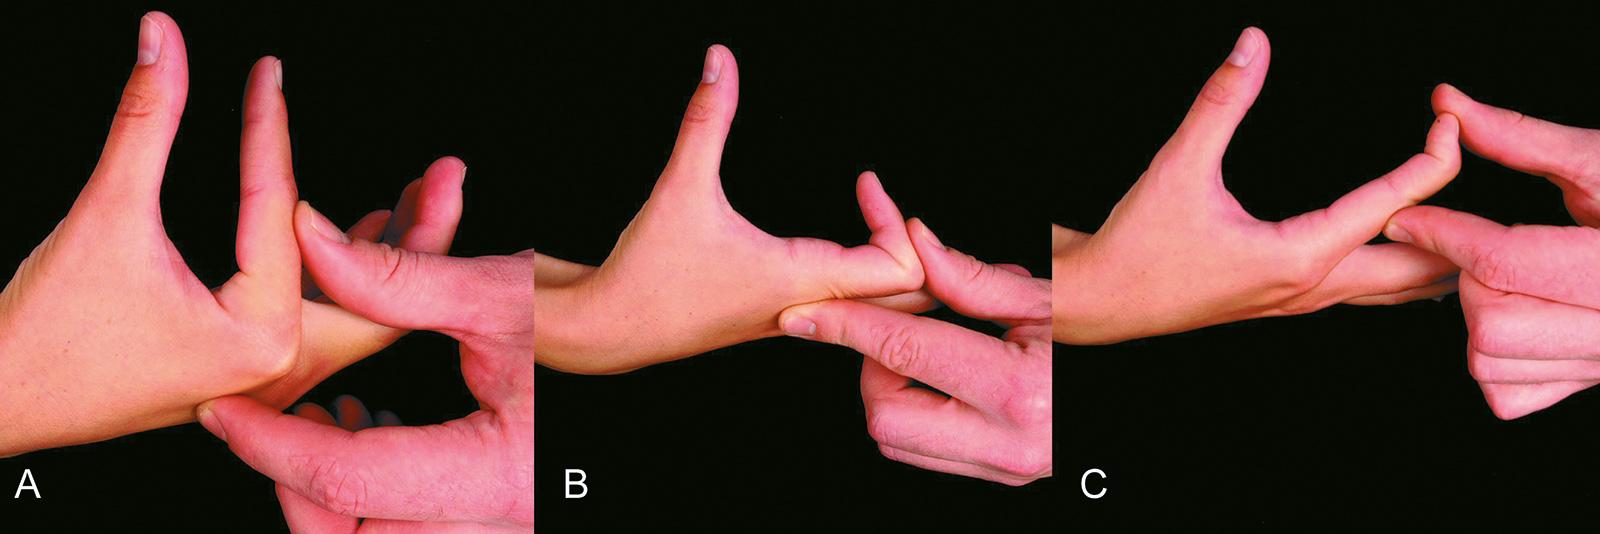 Abb. 7-21: Prüfen der Streckung im Metacarpophalangealgelenk (A), im proximalen Interphalangealgelenk (B) und im distalen Interphalangealgelenk (C)